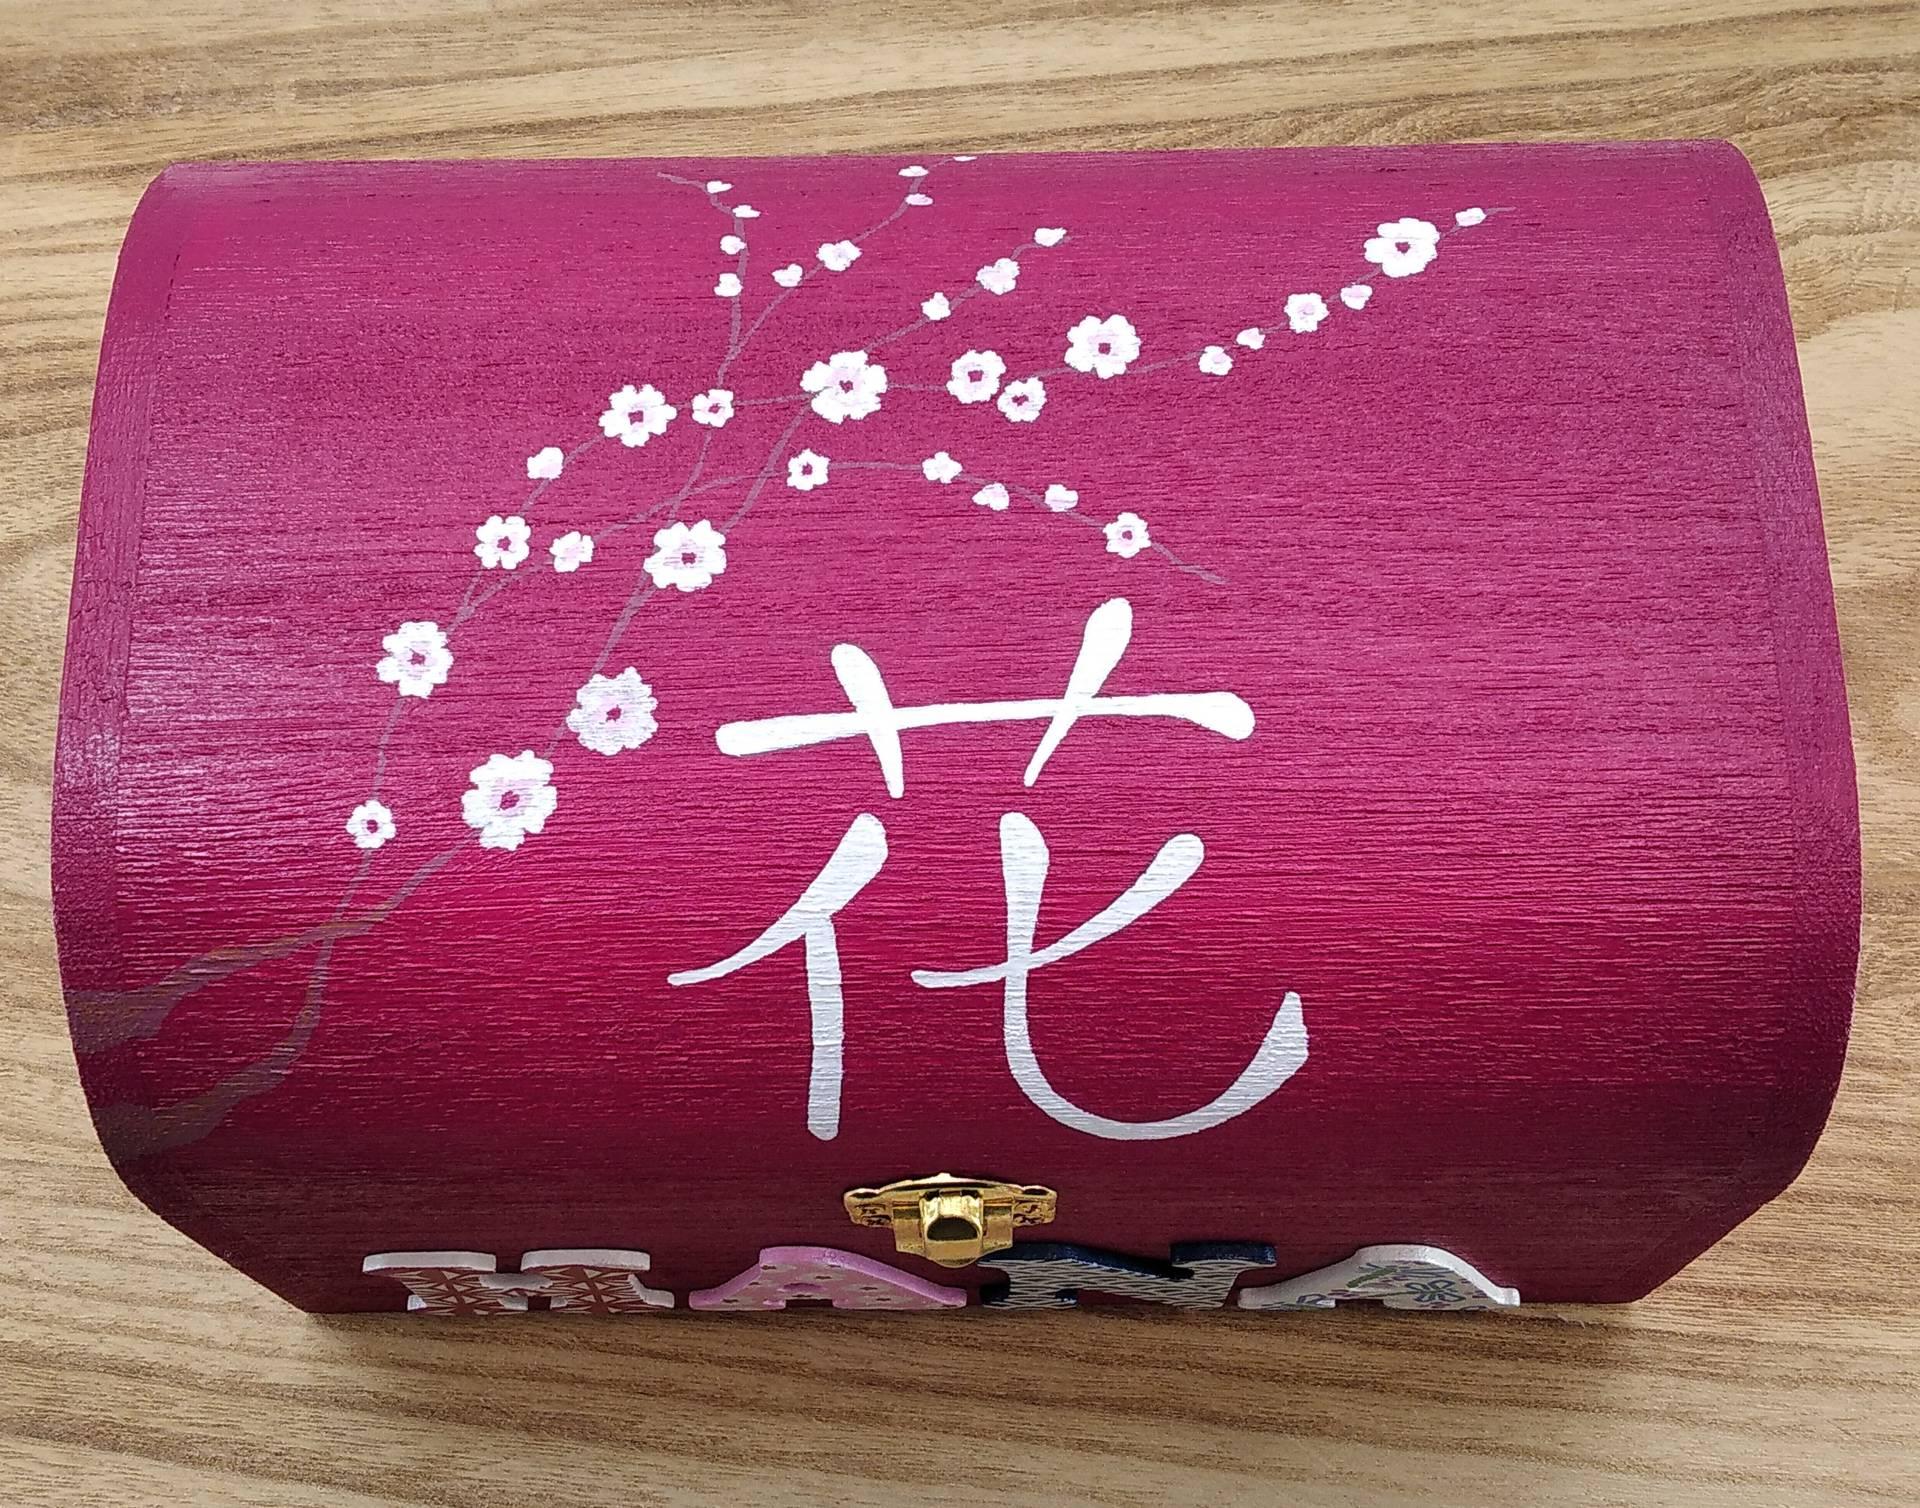 Coffret fuchsia, prénom décoré Hana, thème japonais